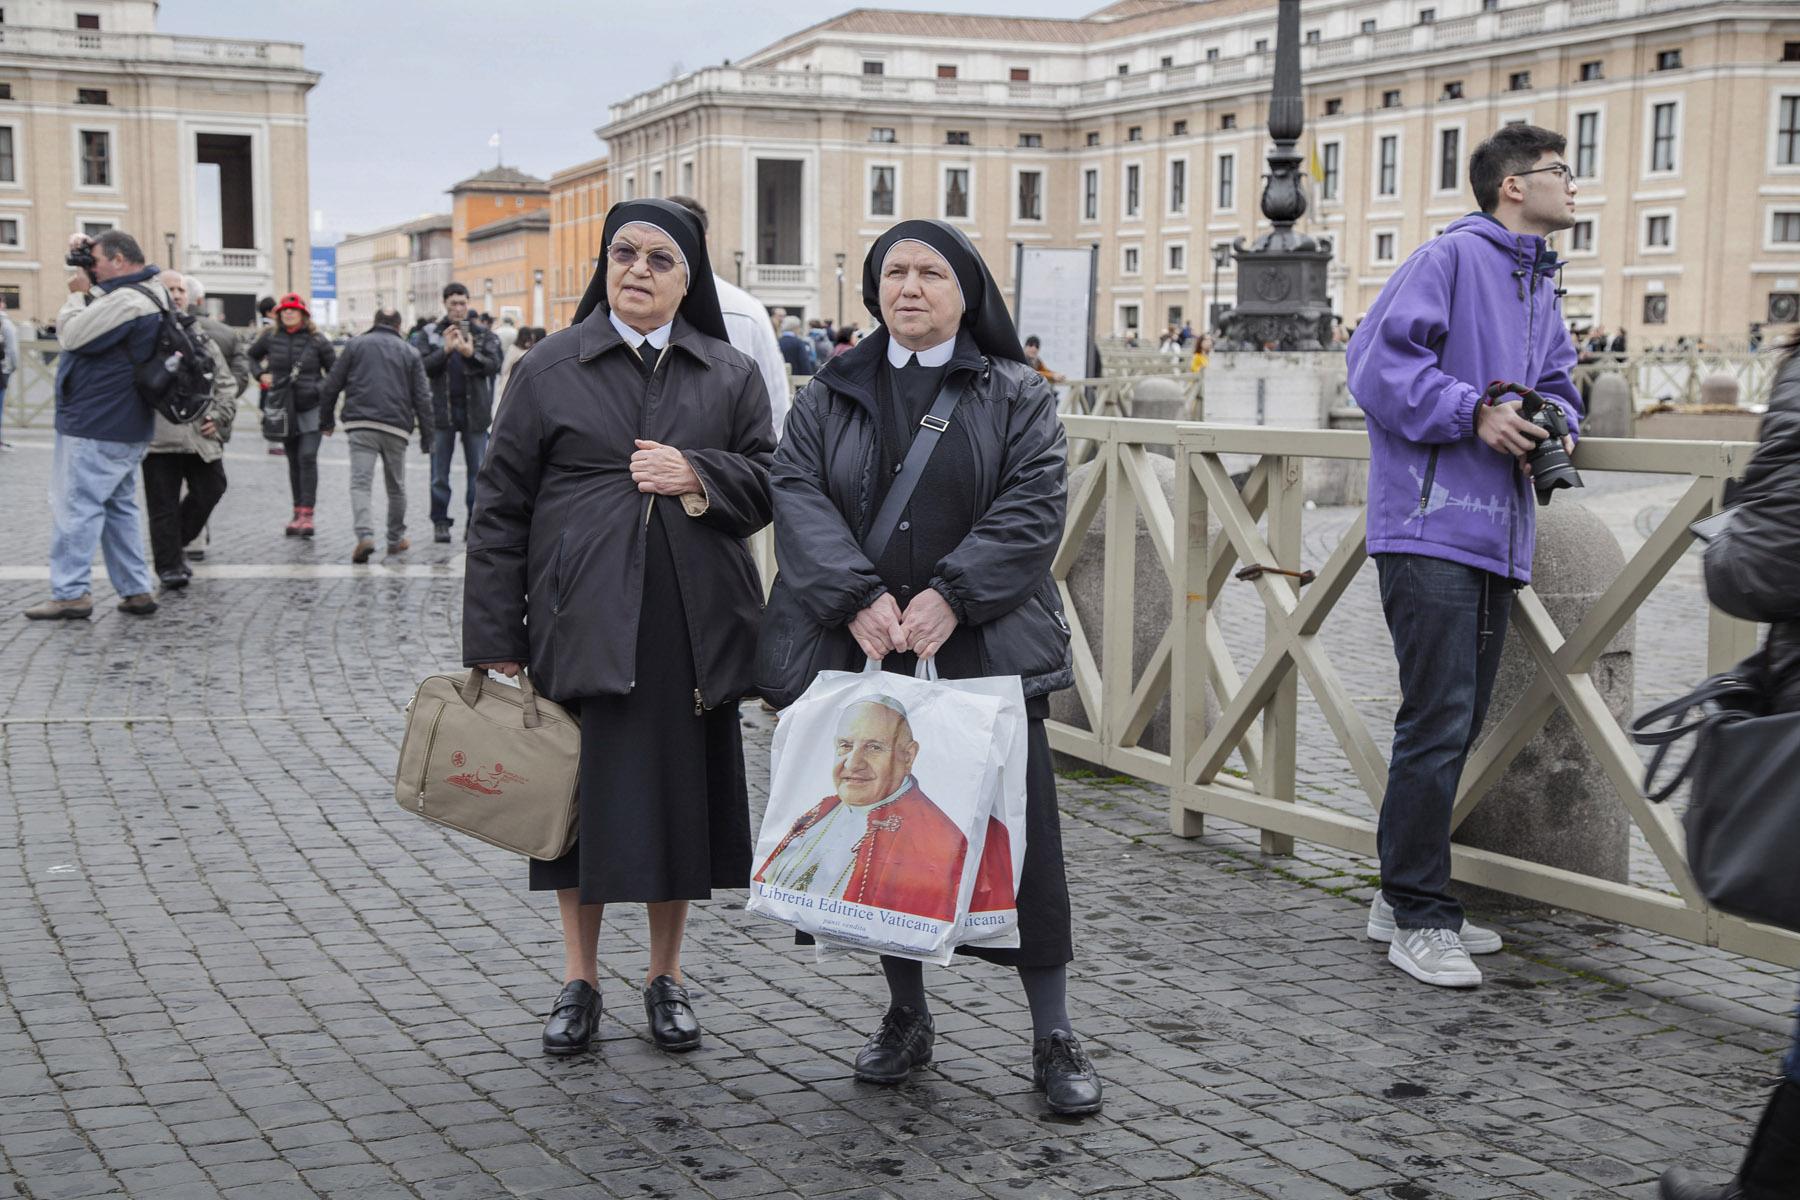 Chiara Spaghetti Kurtovic Popes Two 25